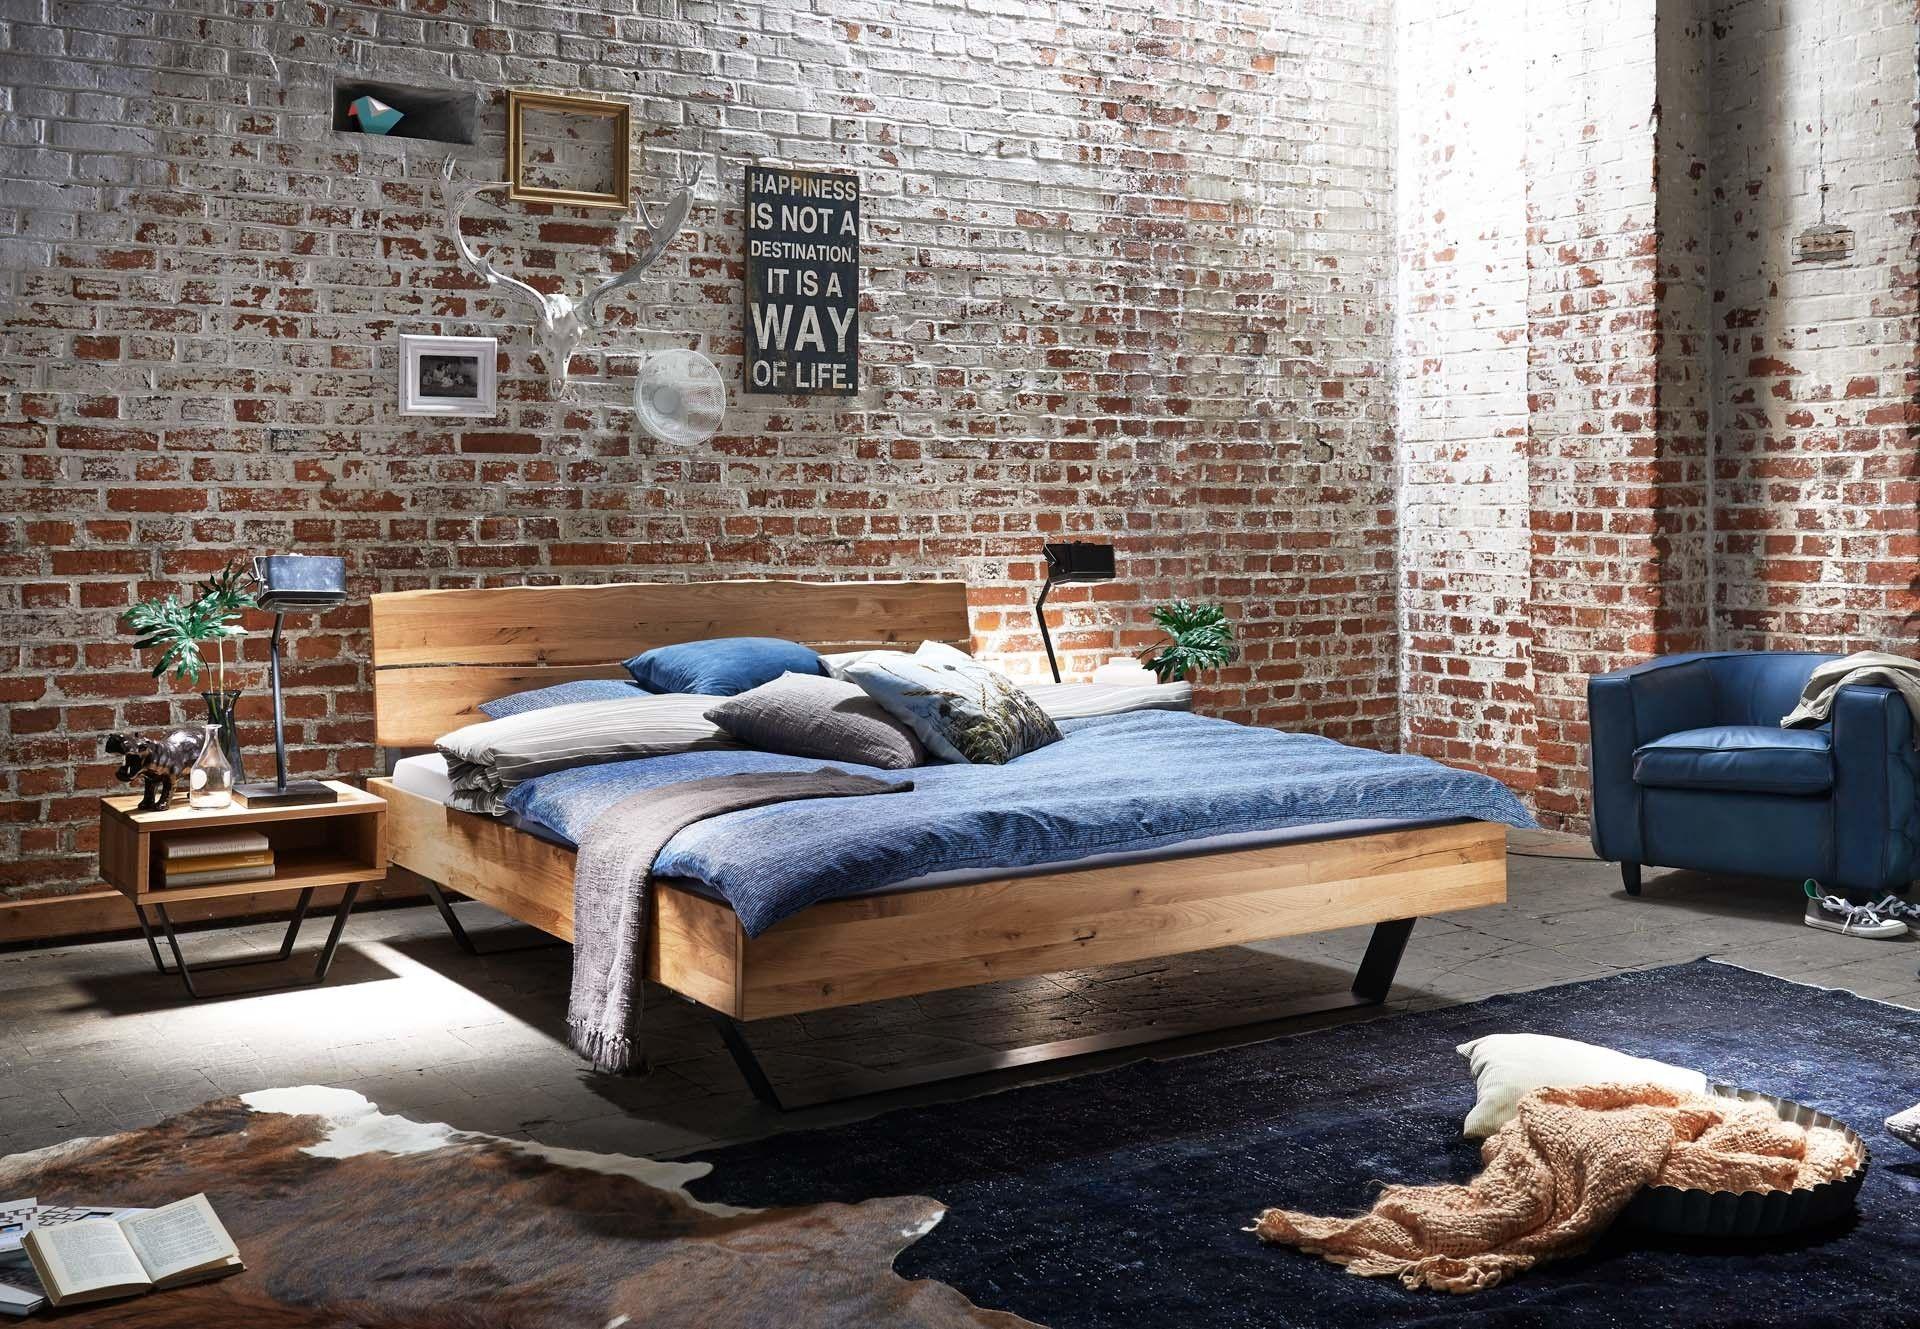 Massivholzbetten design  Bett Eiche massiv geölt mit Baumkante Massivholzbetten | Loft ...